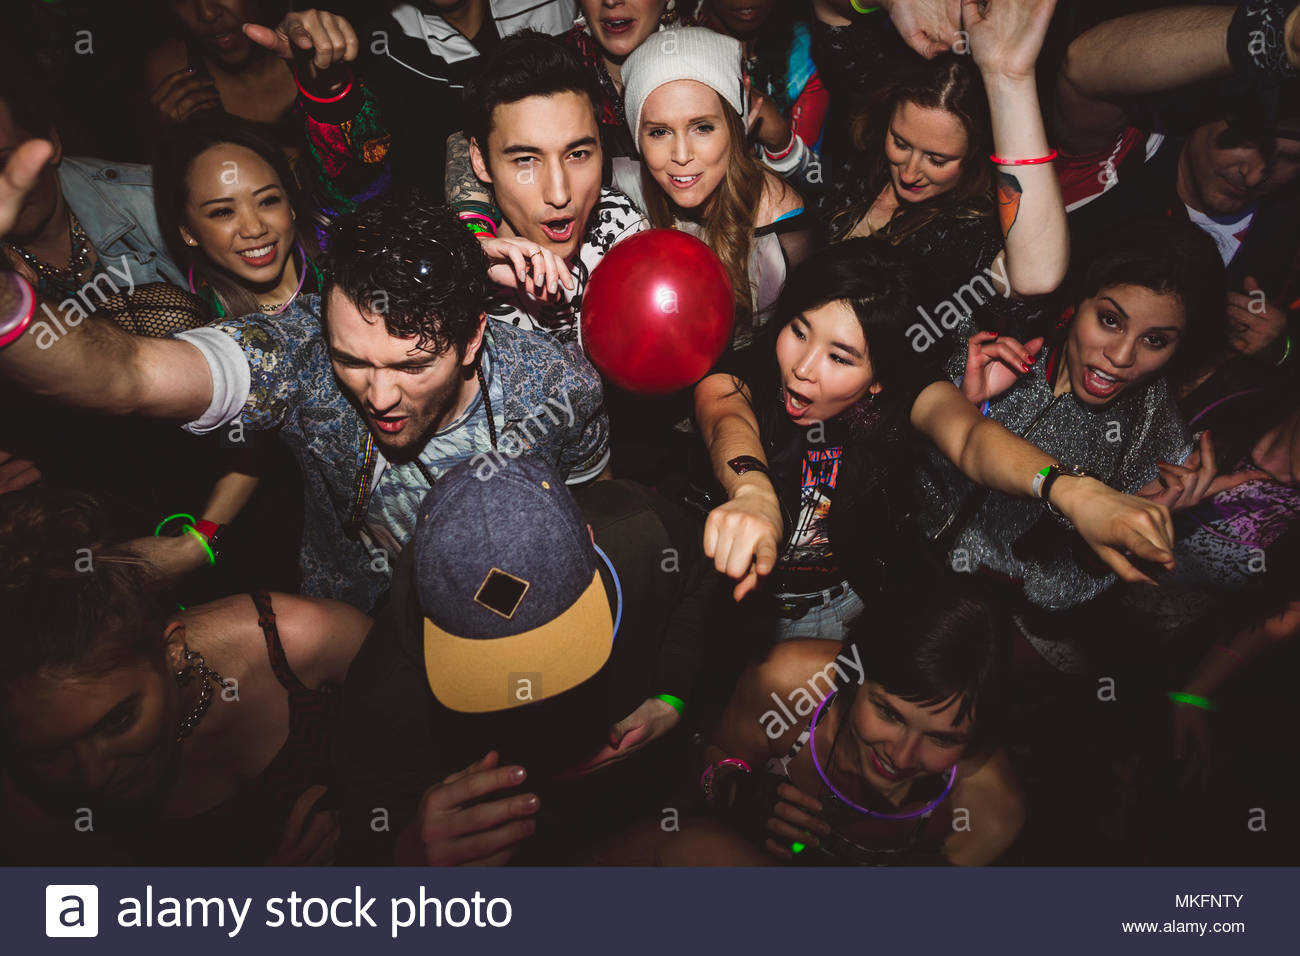 Carefree milennials dancing, partying in discoteca Immagini Stock